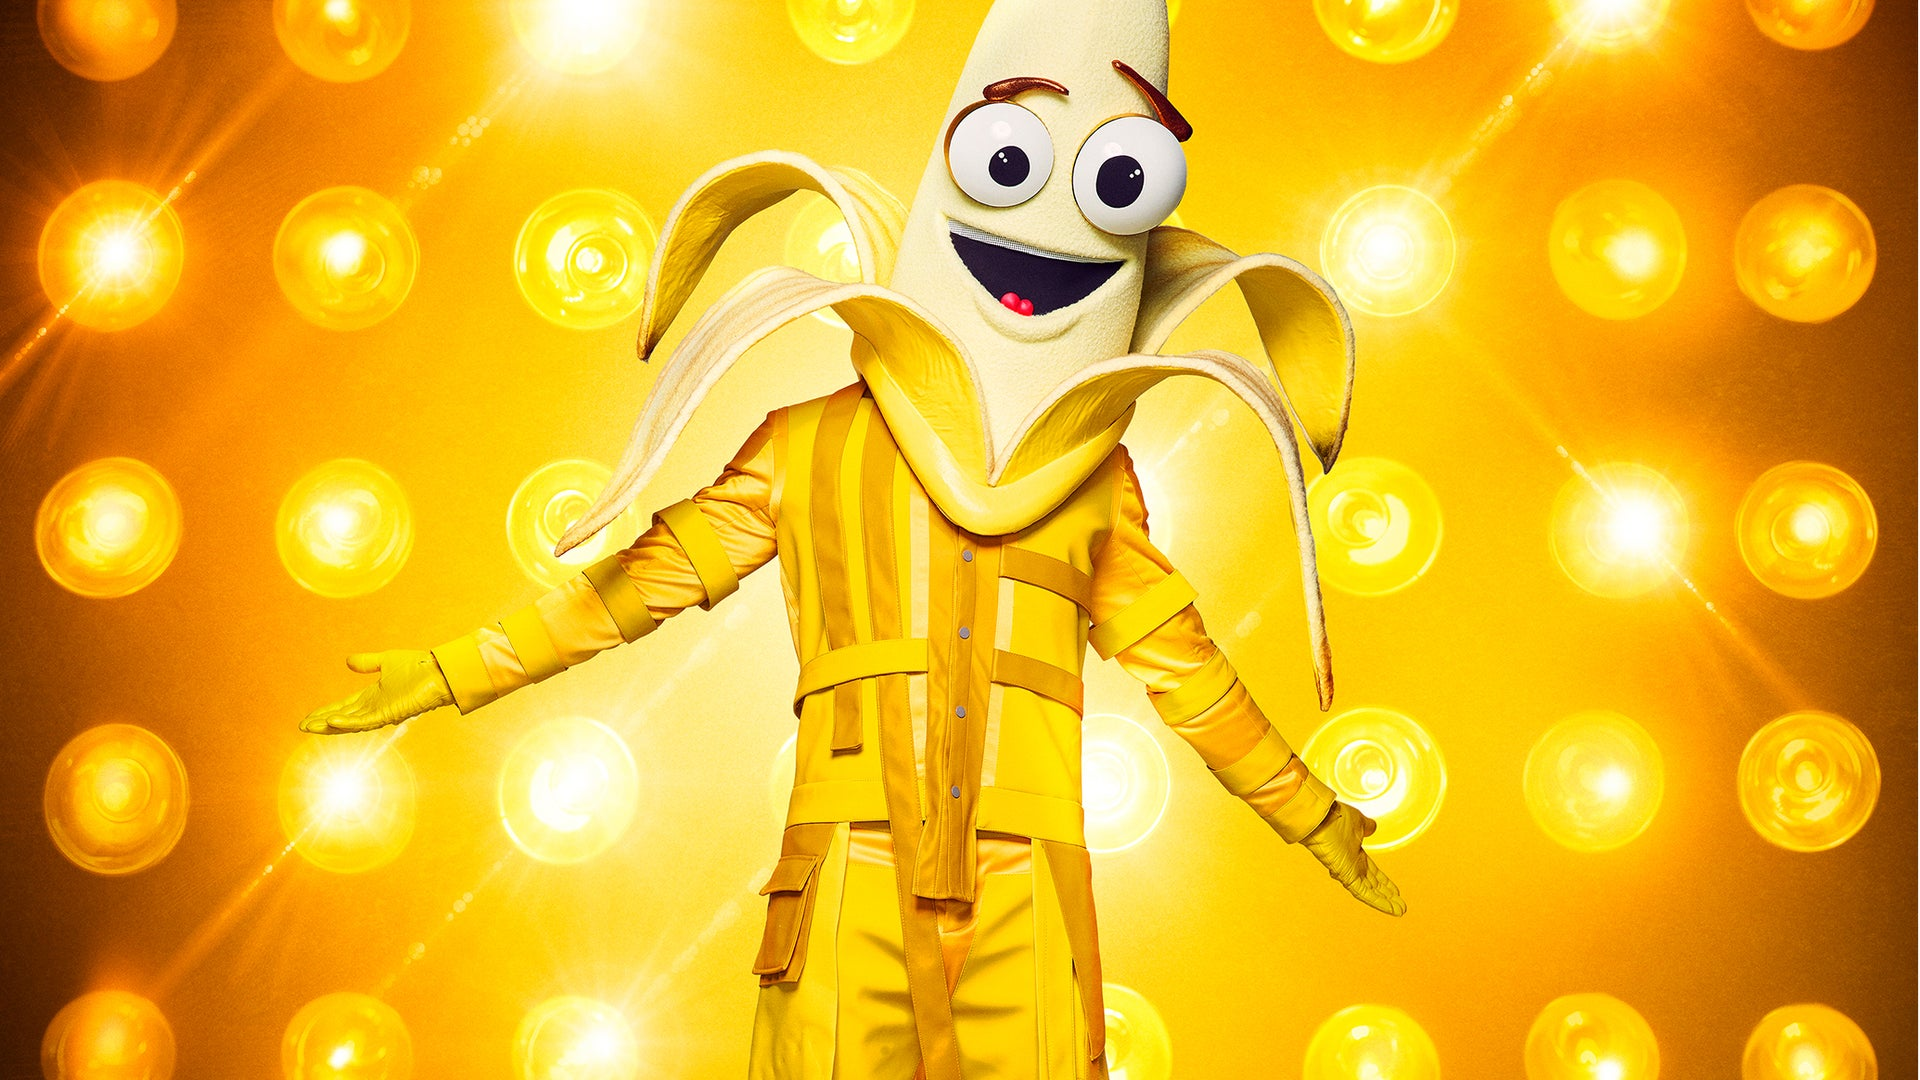 The Banana, The Masked Singer Season 3